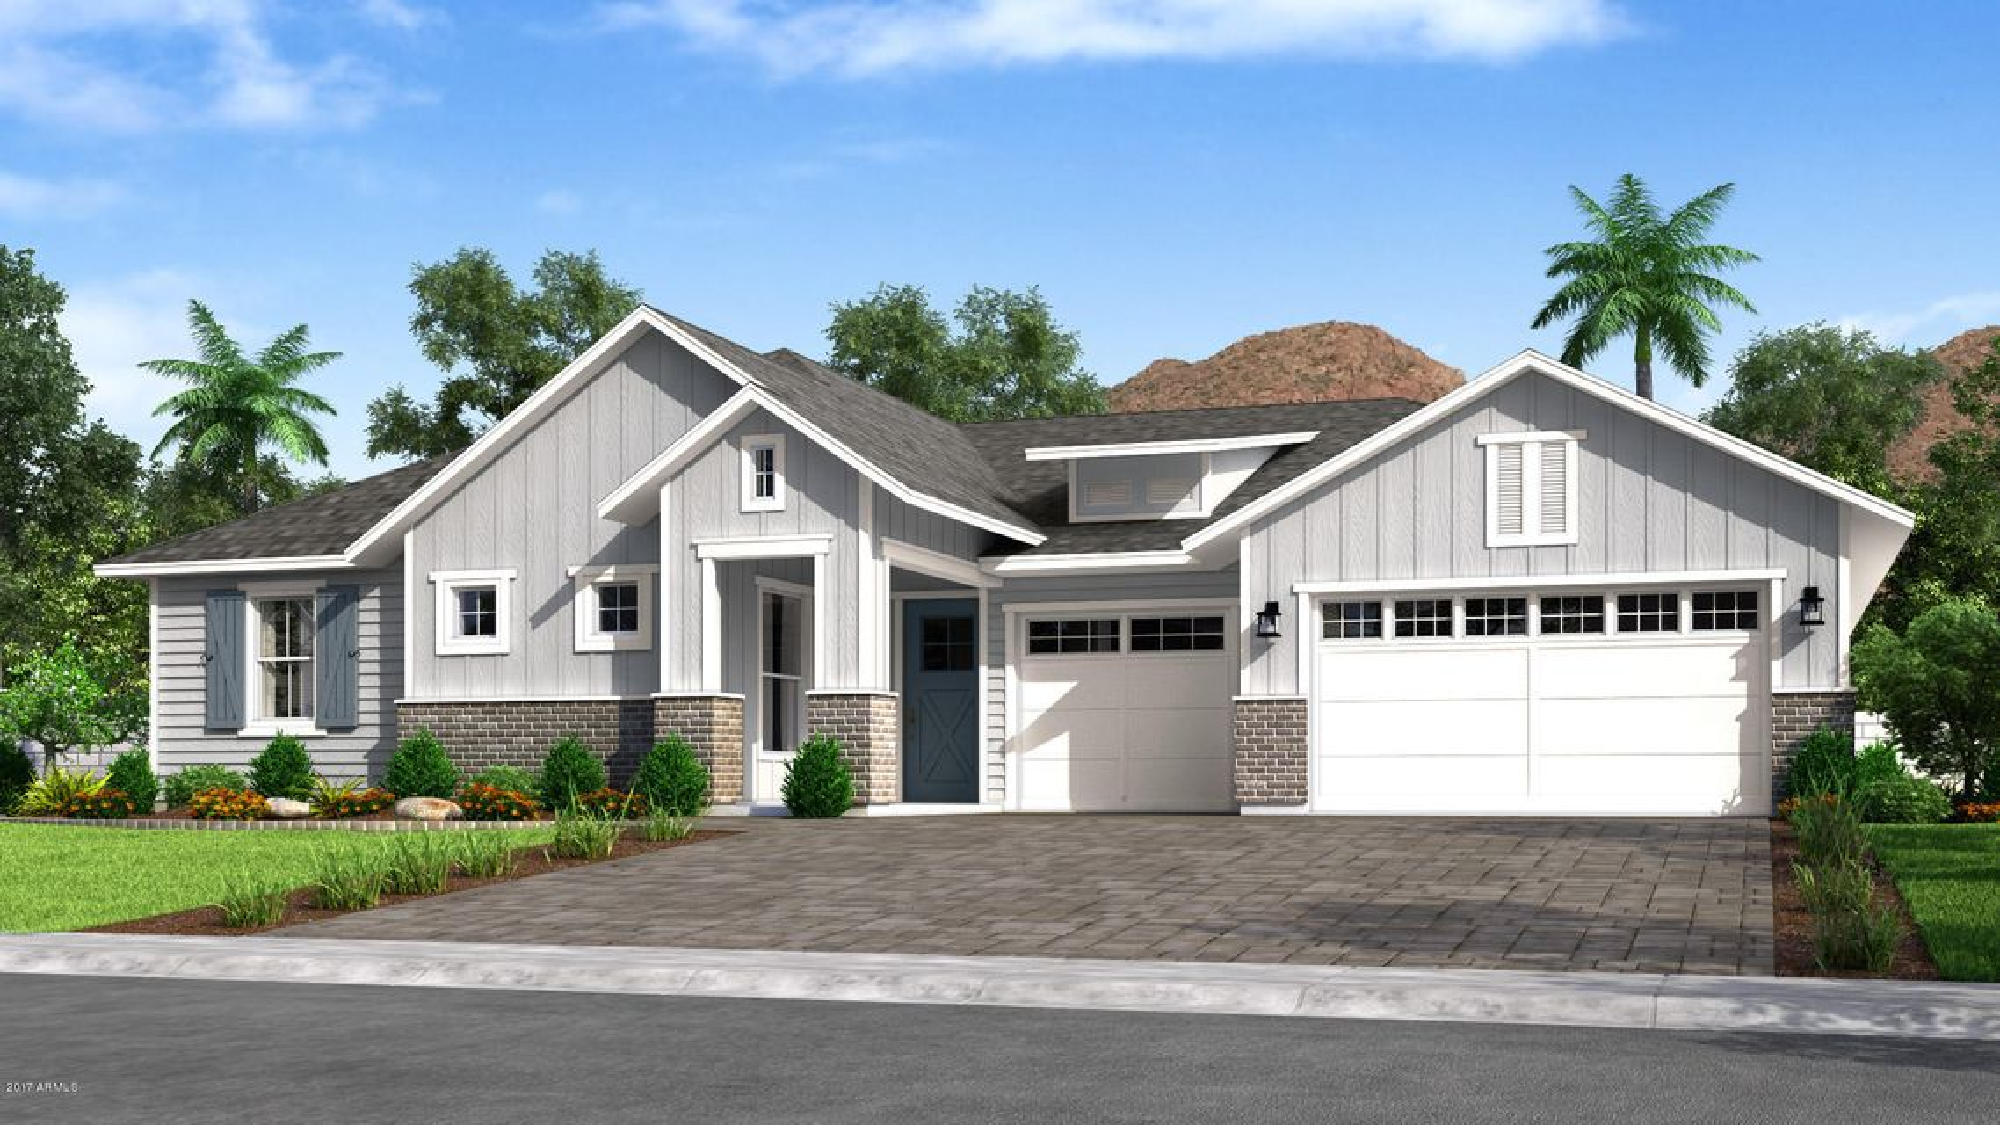 4438 47TH Street,Phoenix,Arizona 85018,4 Bedrooms Bedrooms,3.5 BathroomsBathrooms,Residential,47TH,5670046